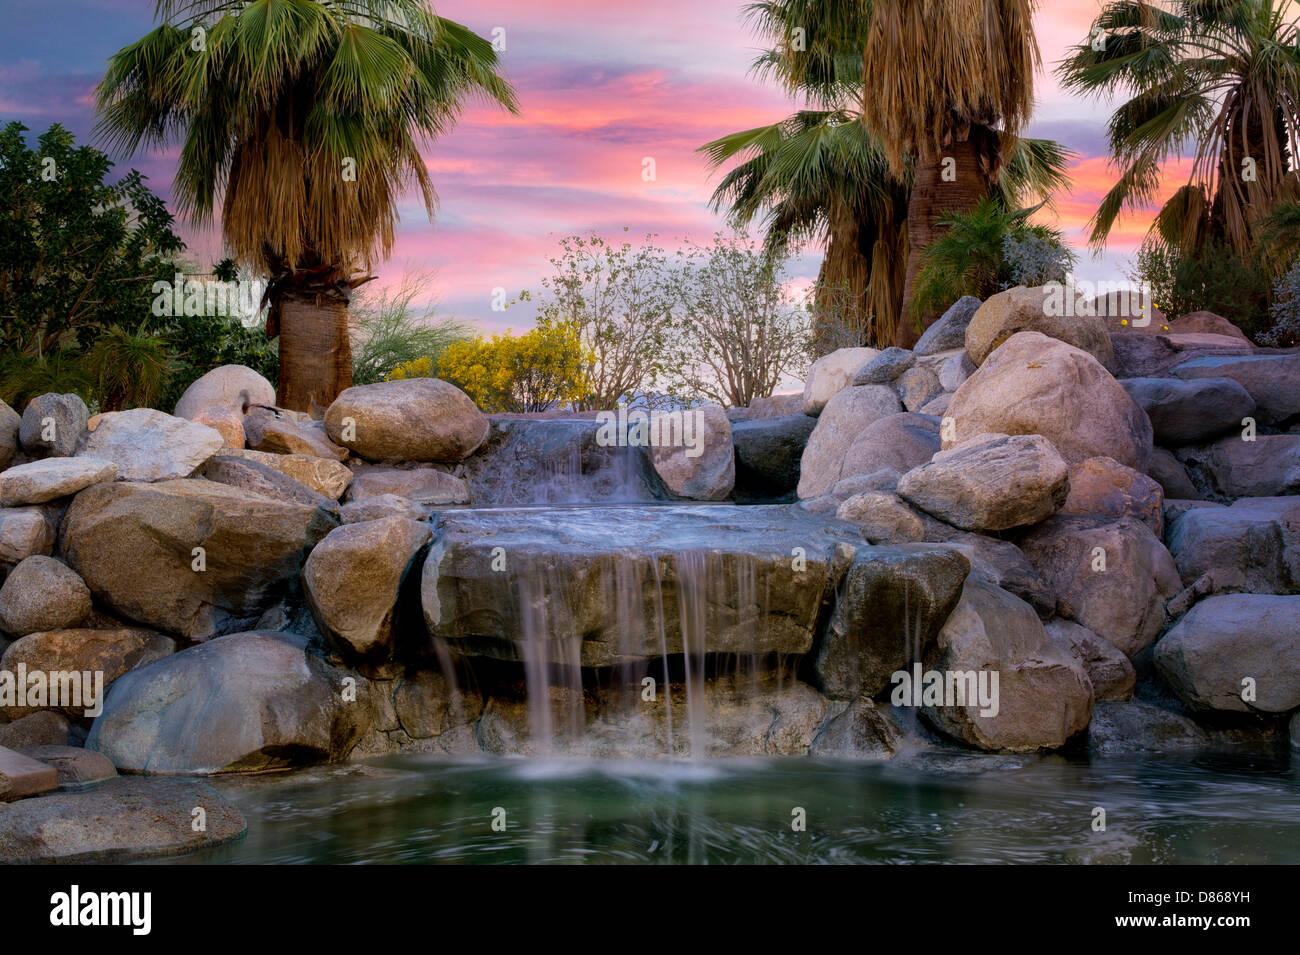 Waterfalls in Faye Sarkowsky Sculpture Garden. Palm Desert, California - Stock Image